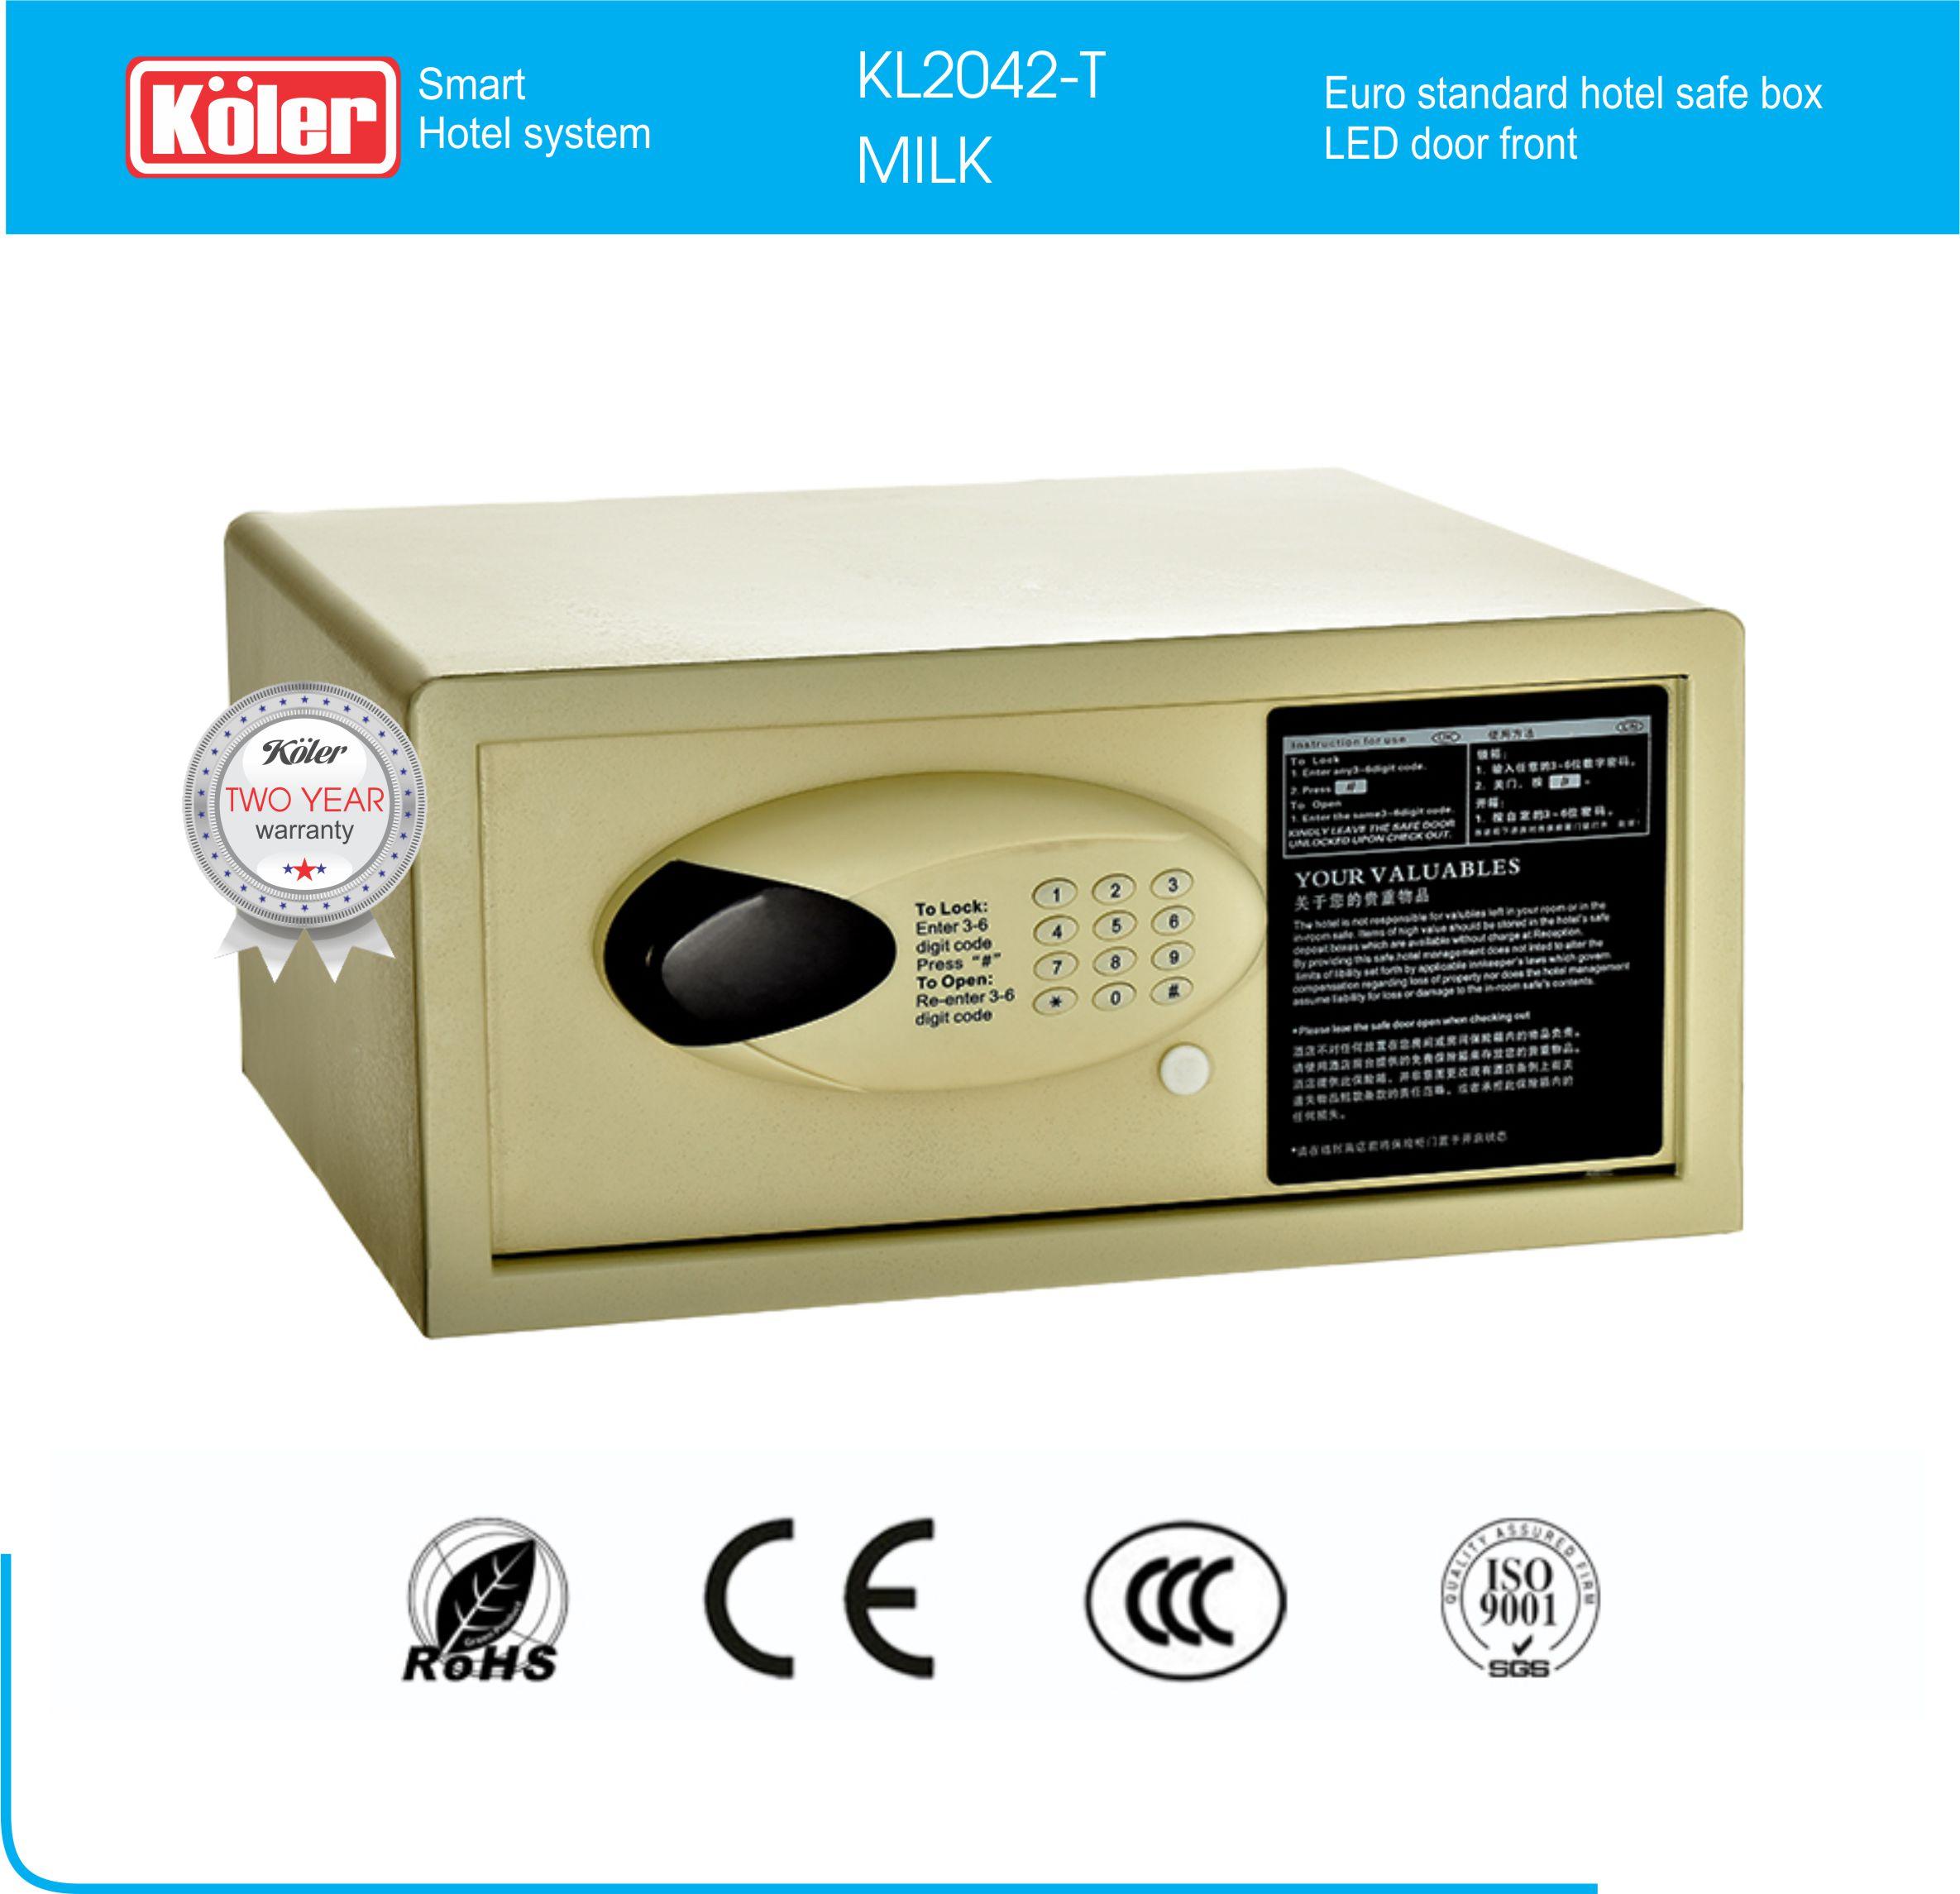 Safe box KL2042-T Milk